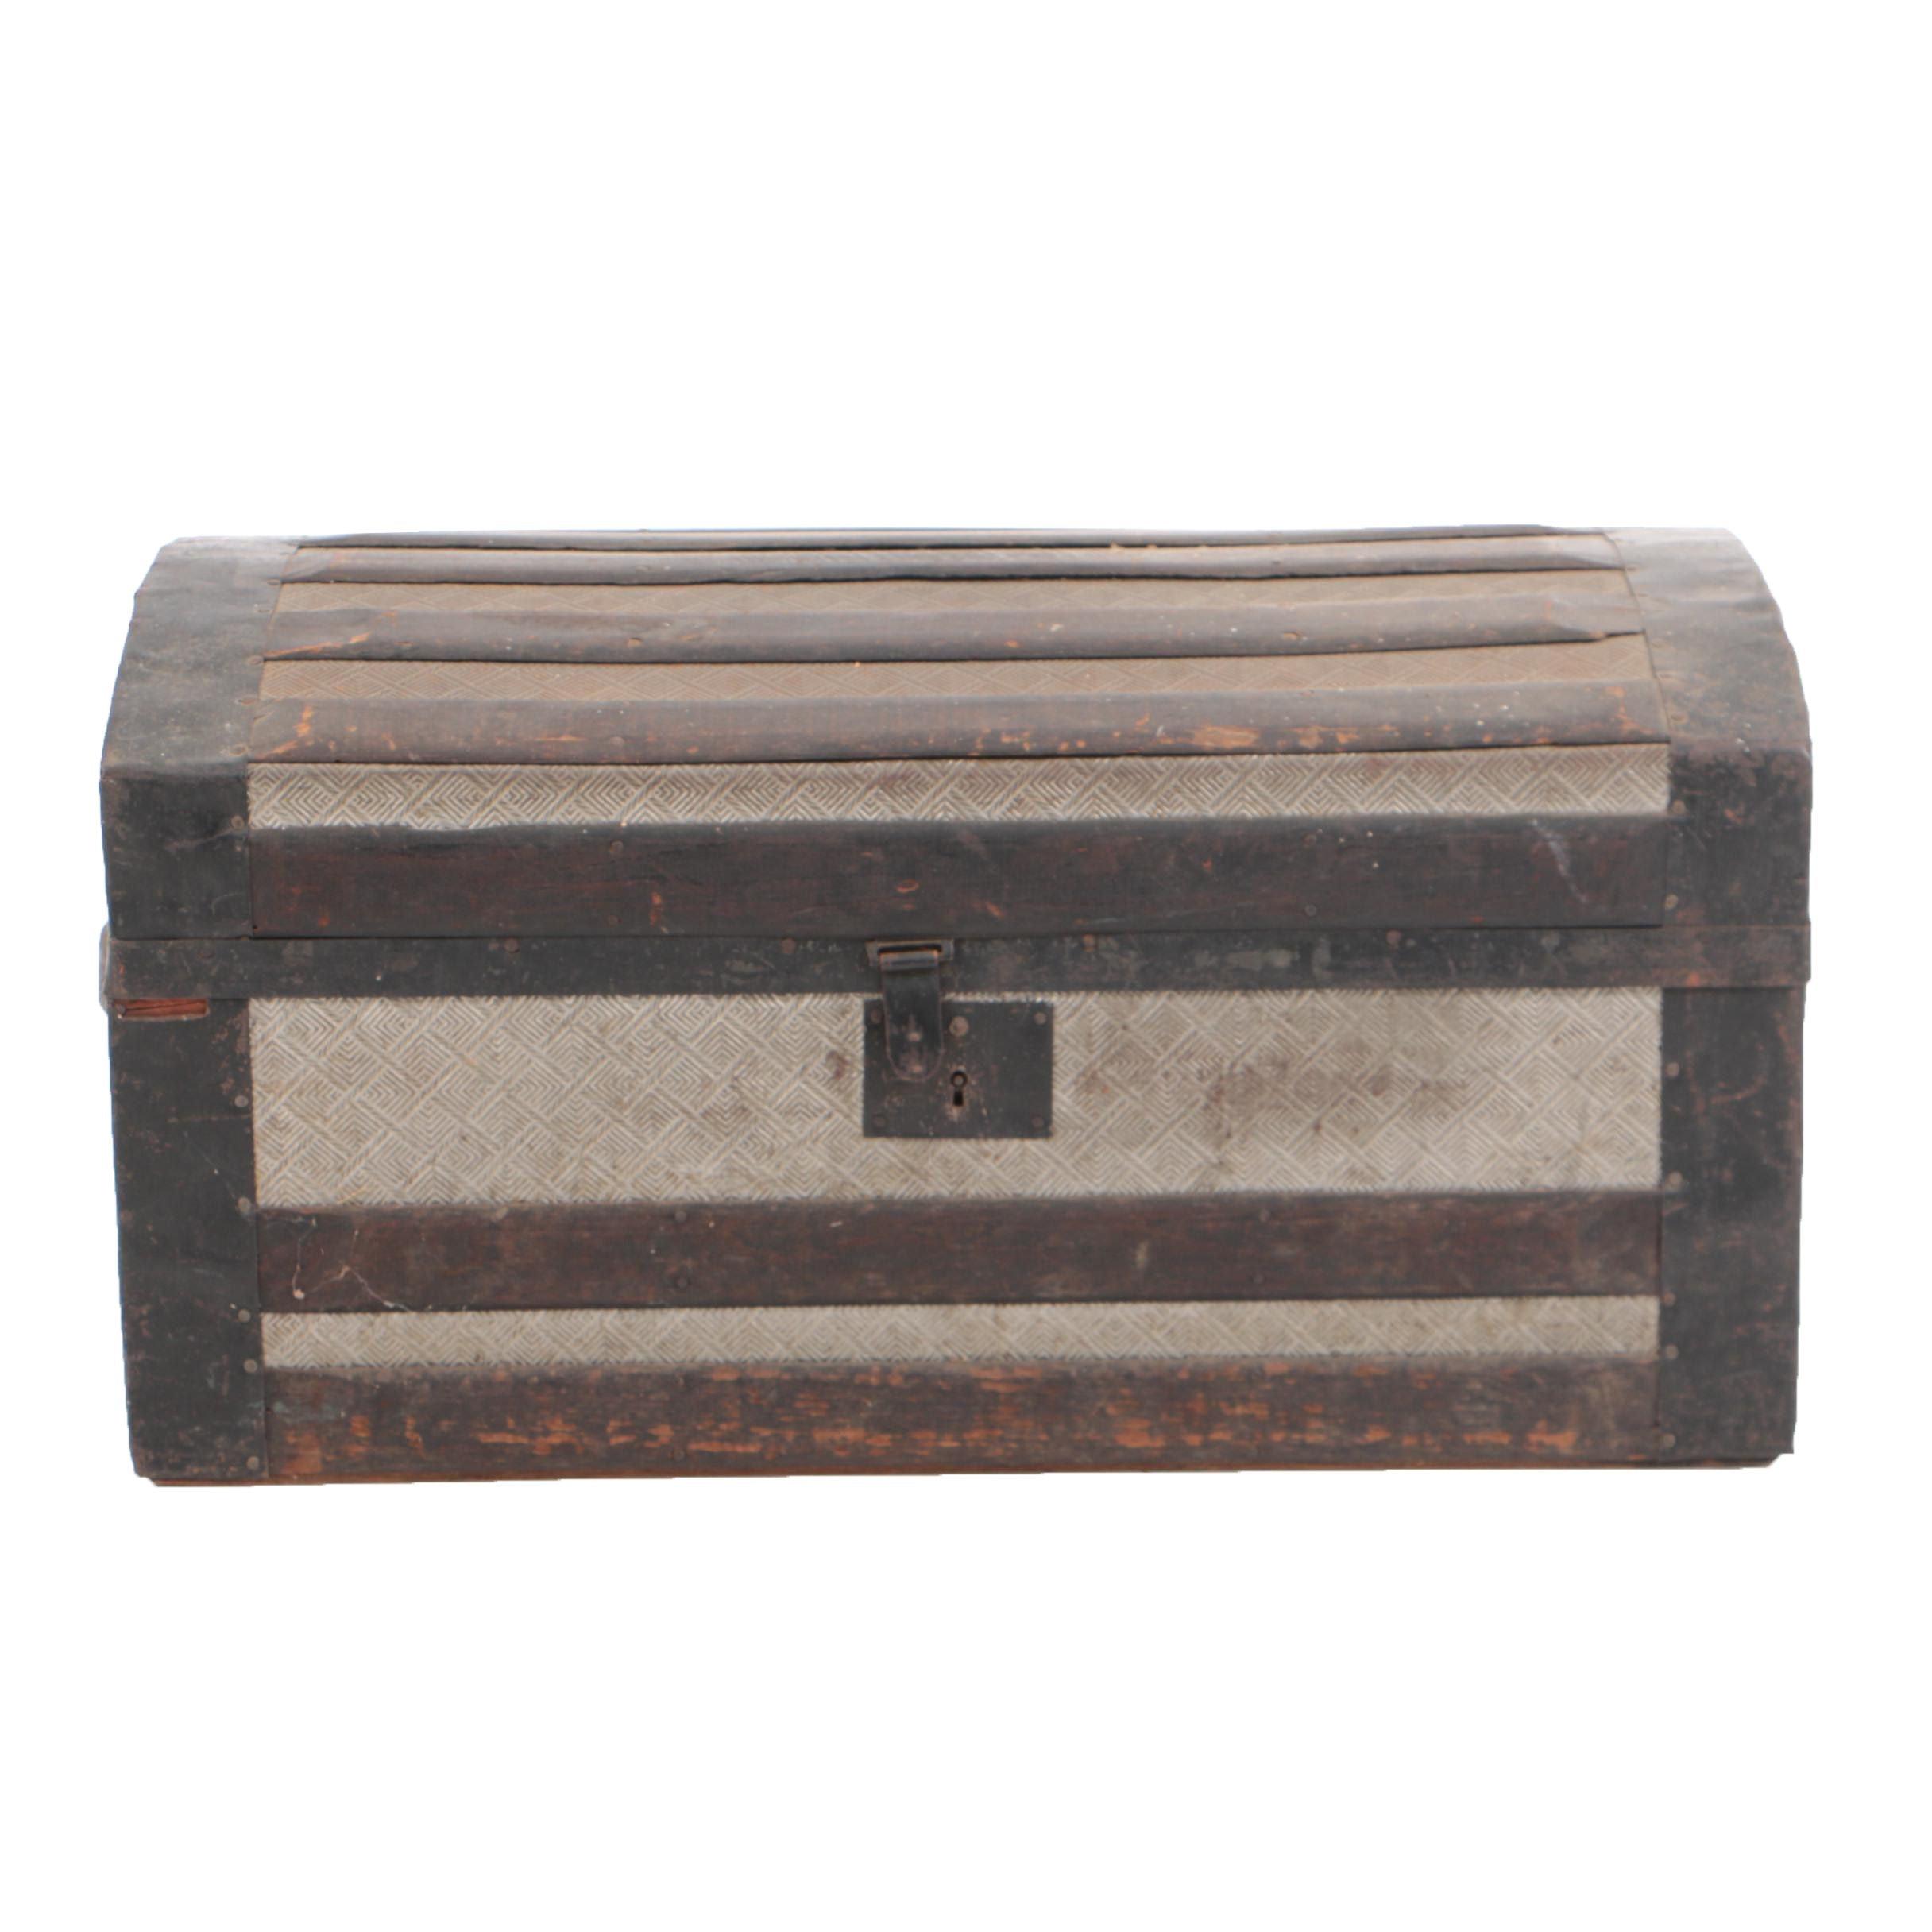 Antique Roll-Top Steamer Trunk